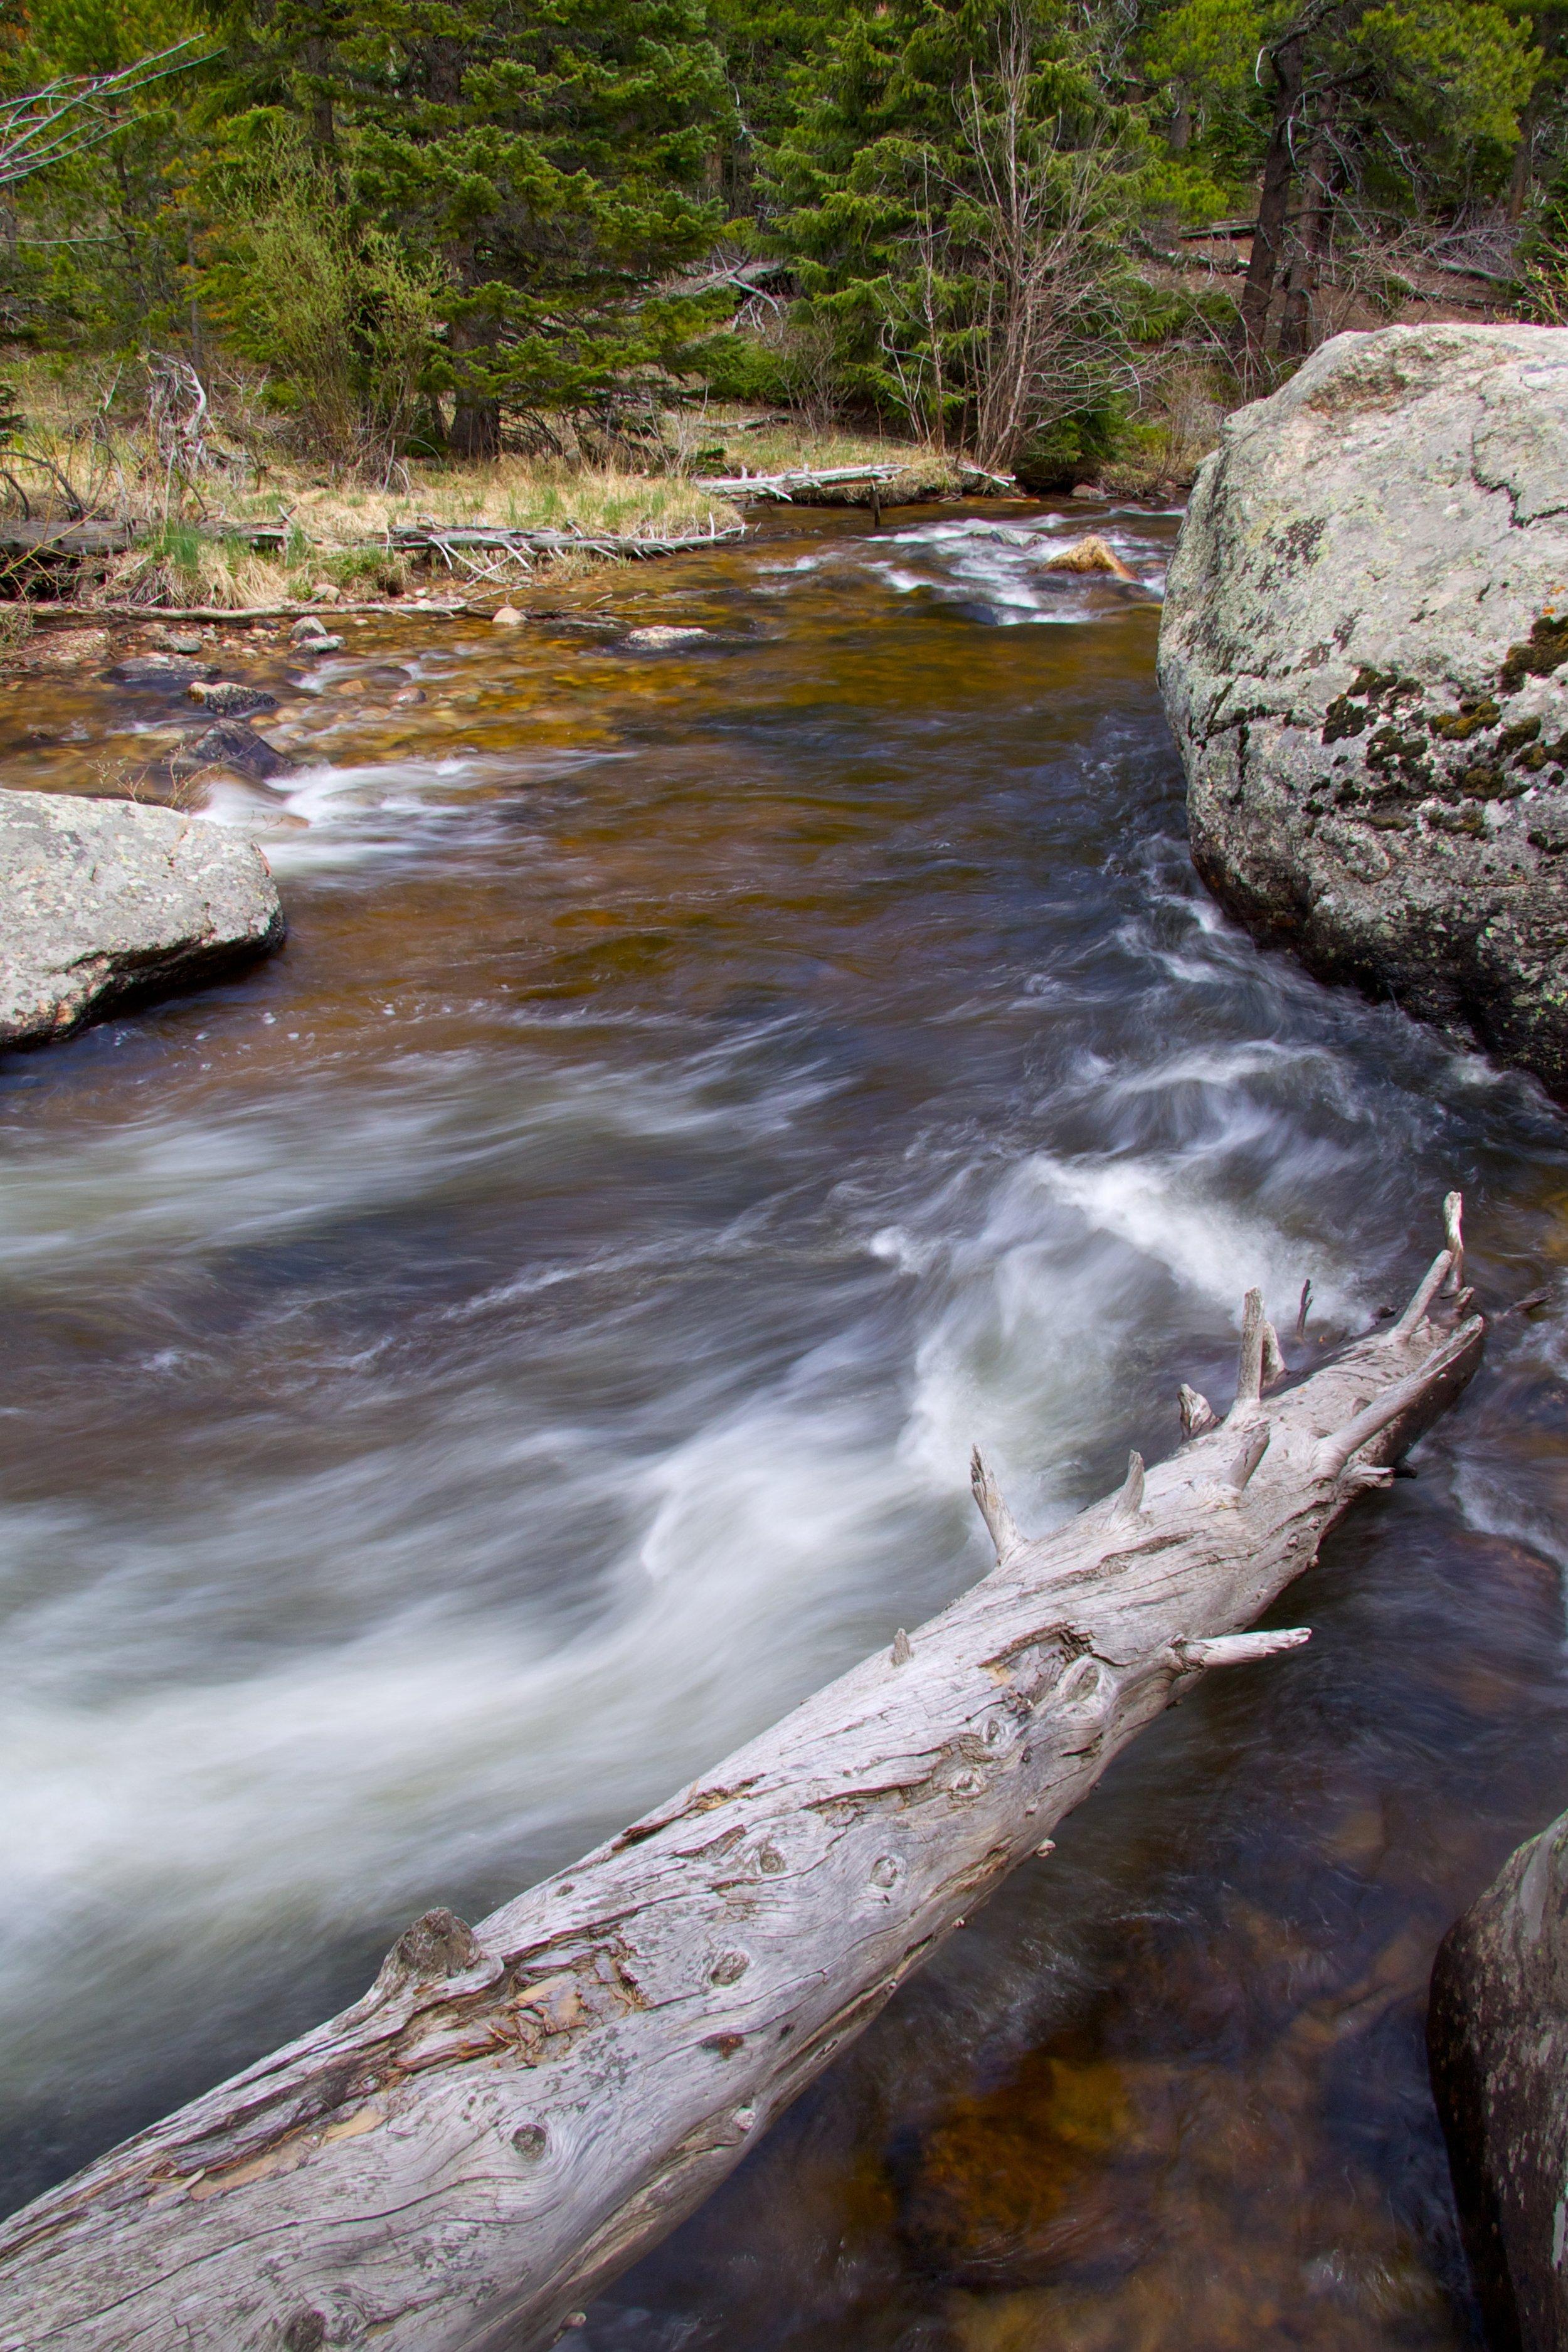 St. Vrain Creek